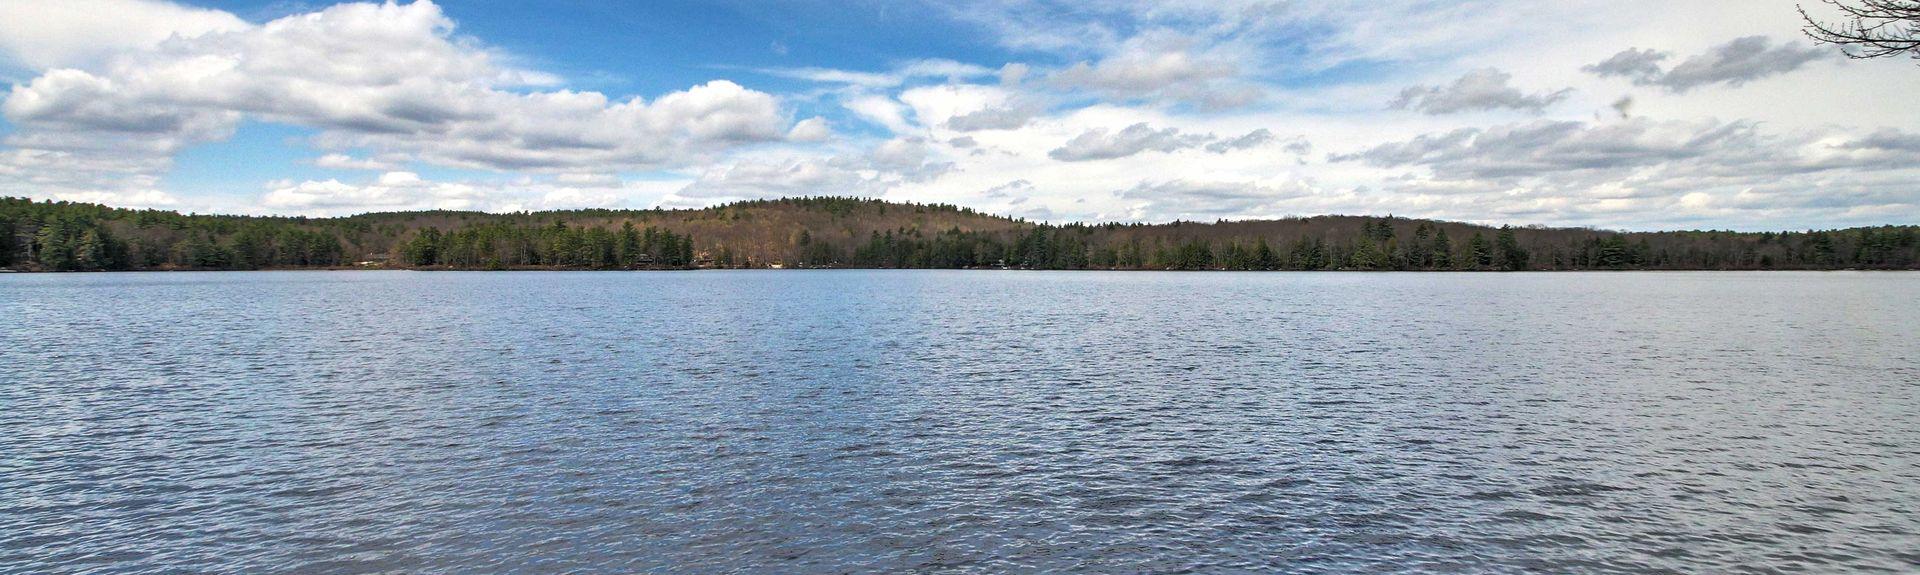 Mont Vernon, New Hampshire, United States